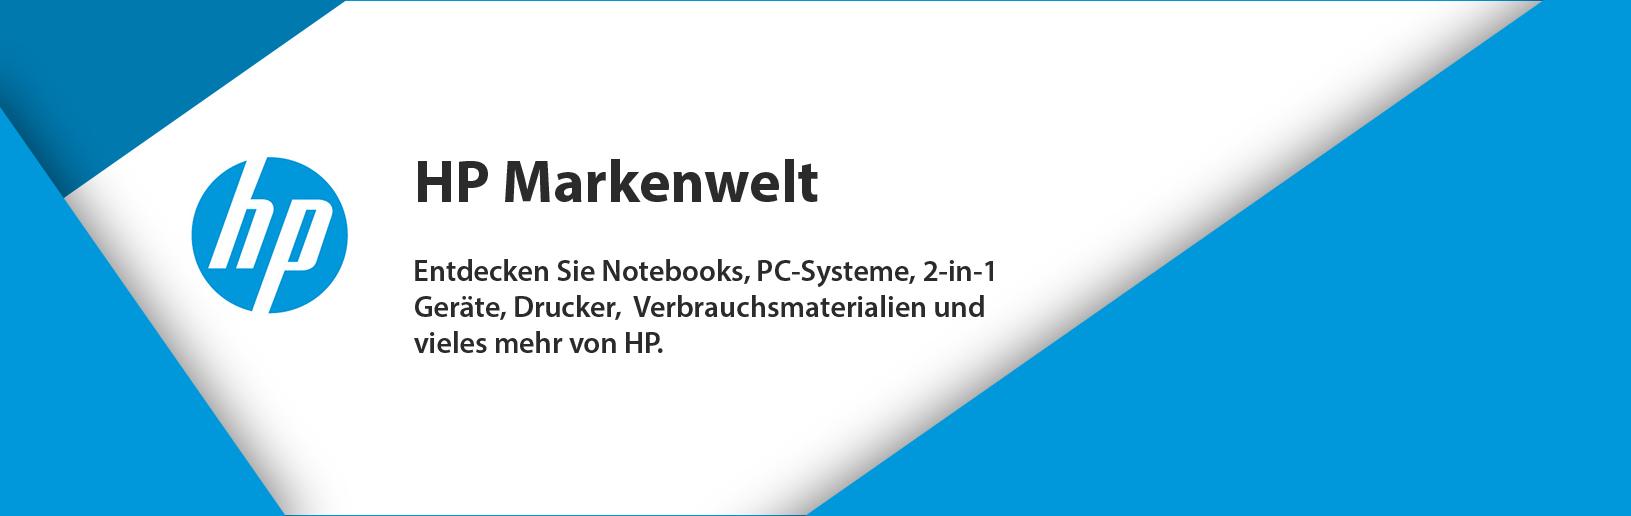 HP-Markenweltslider